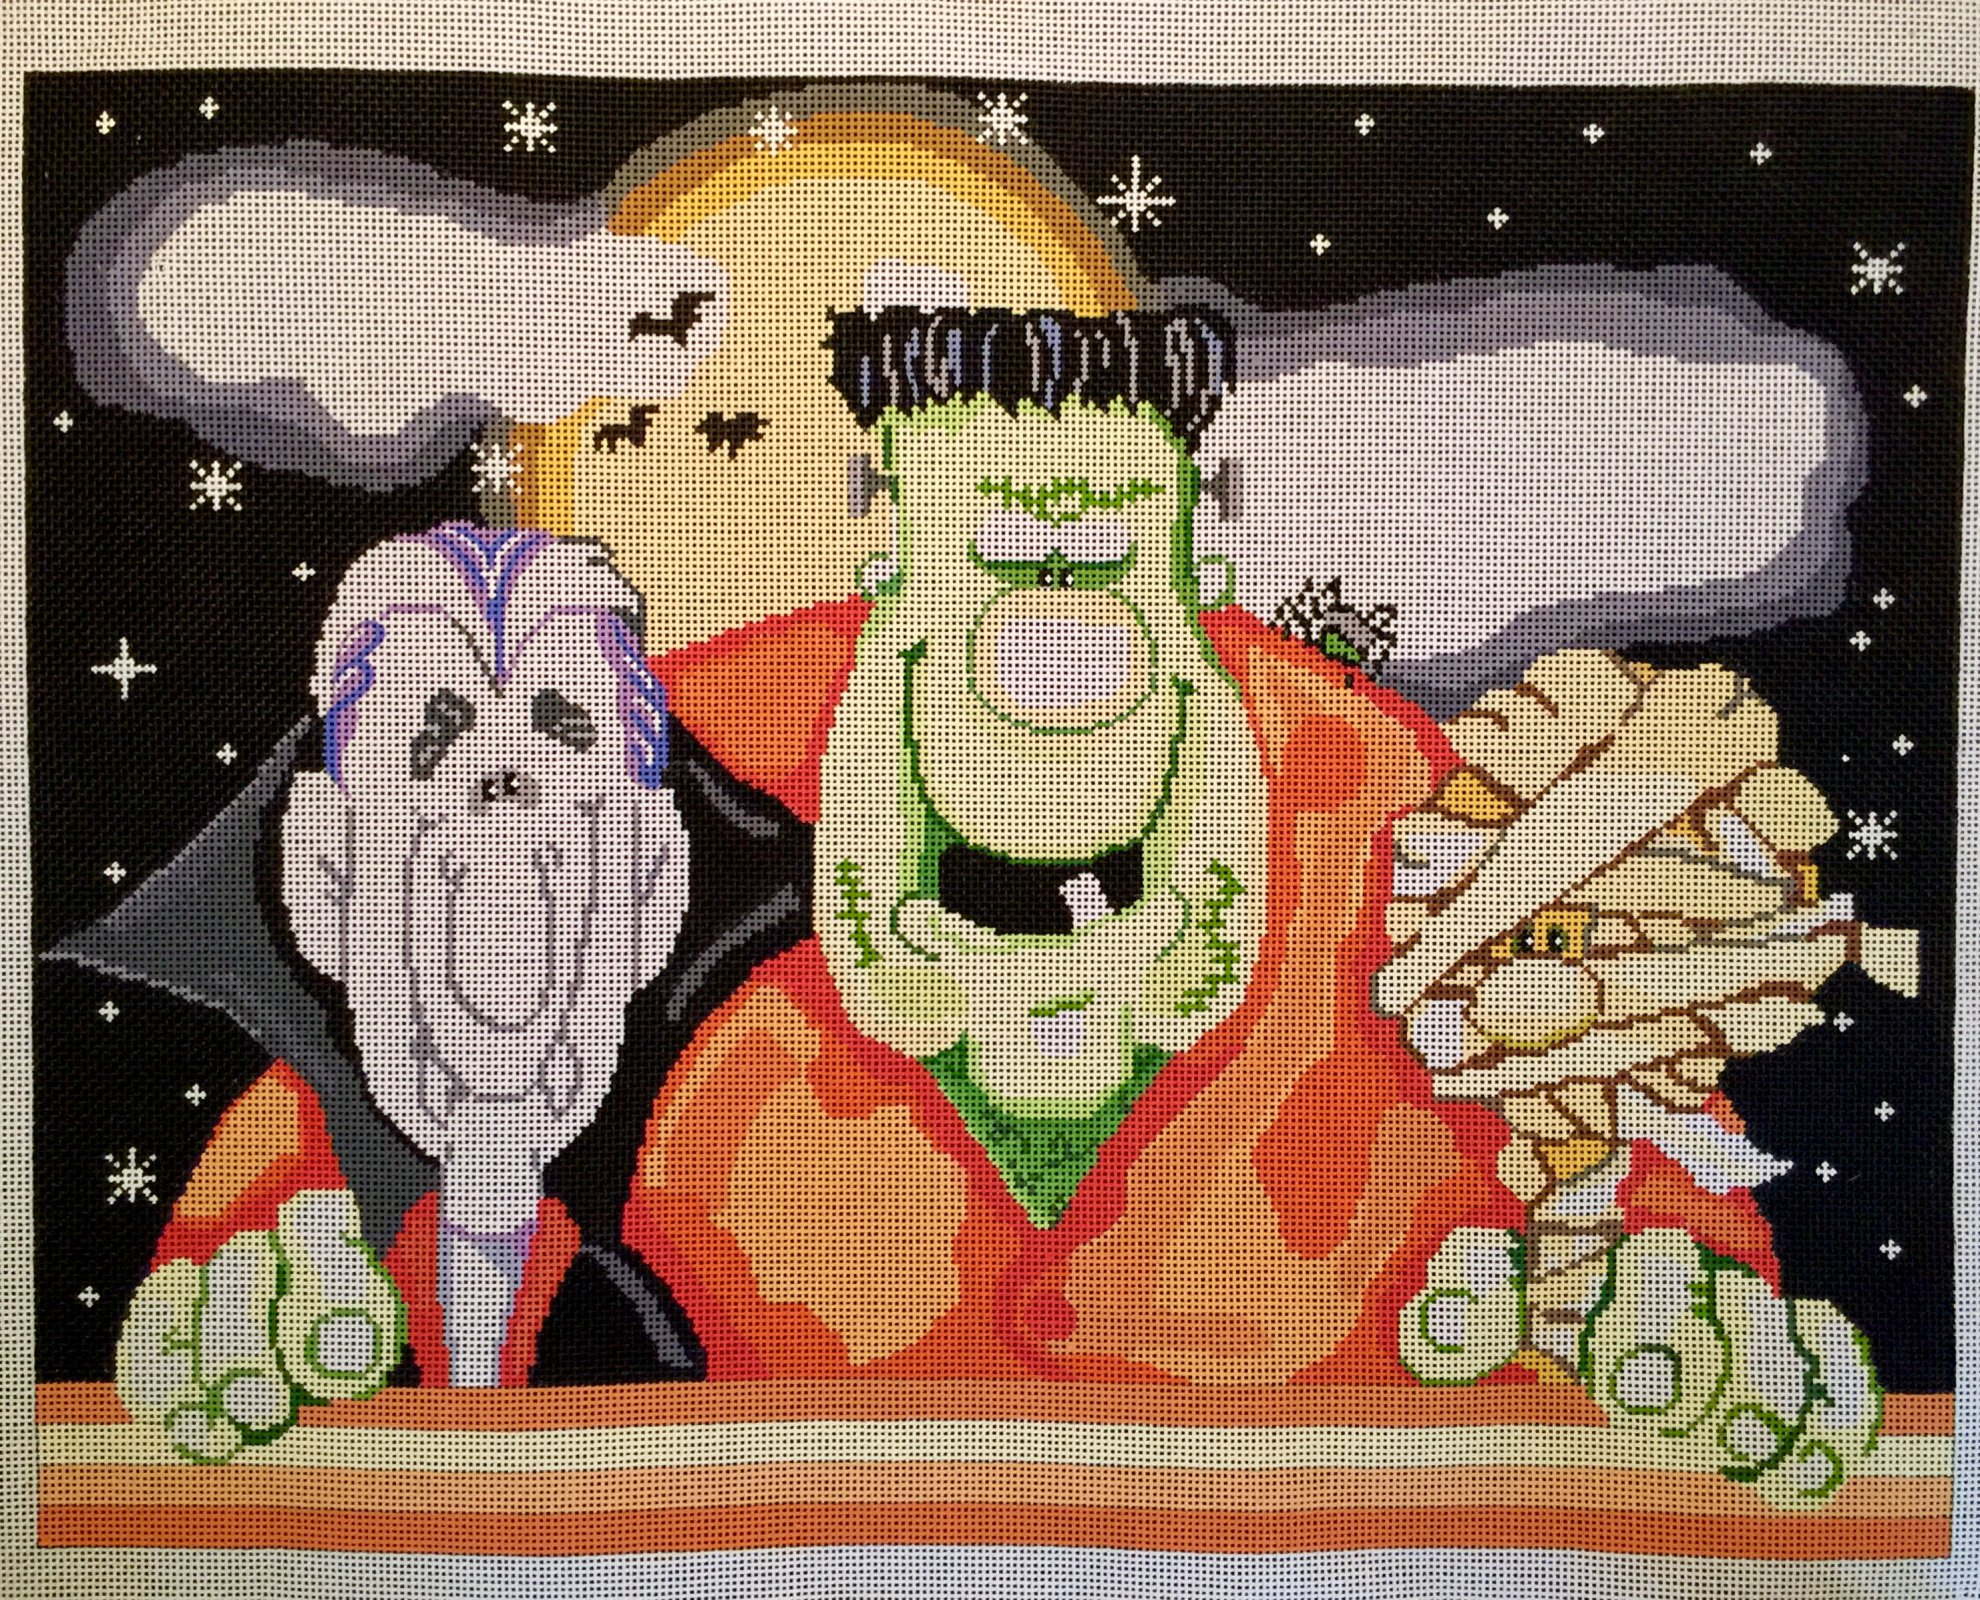 Dracula, Frankenstein, Mummy